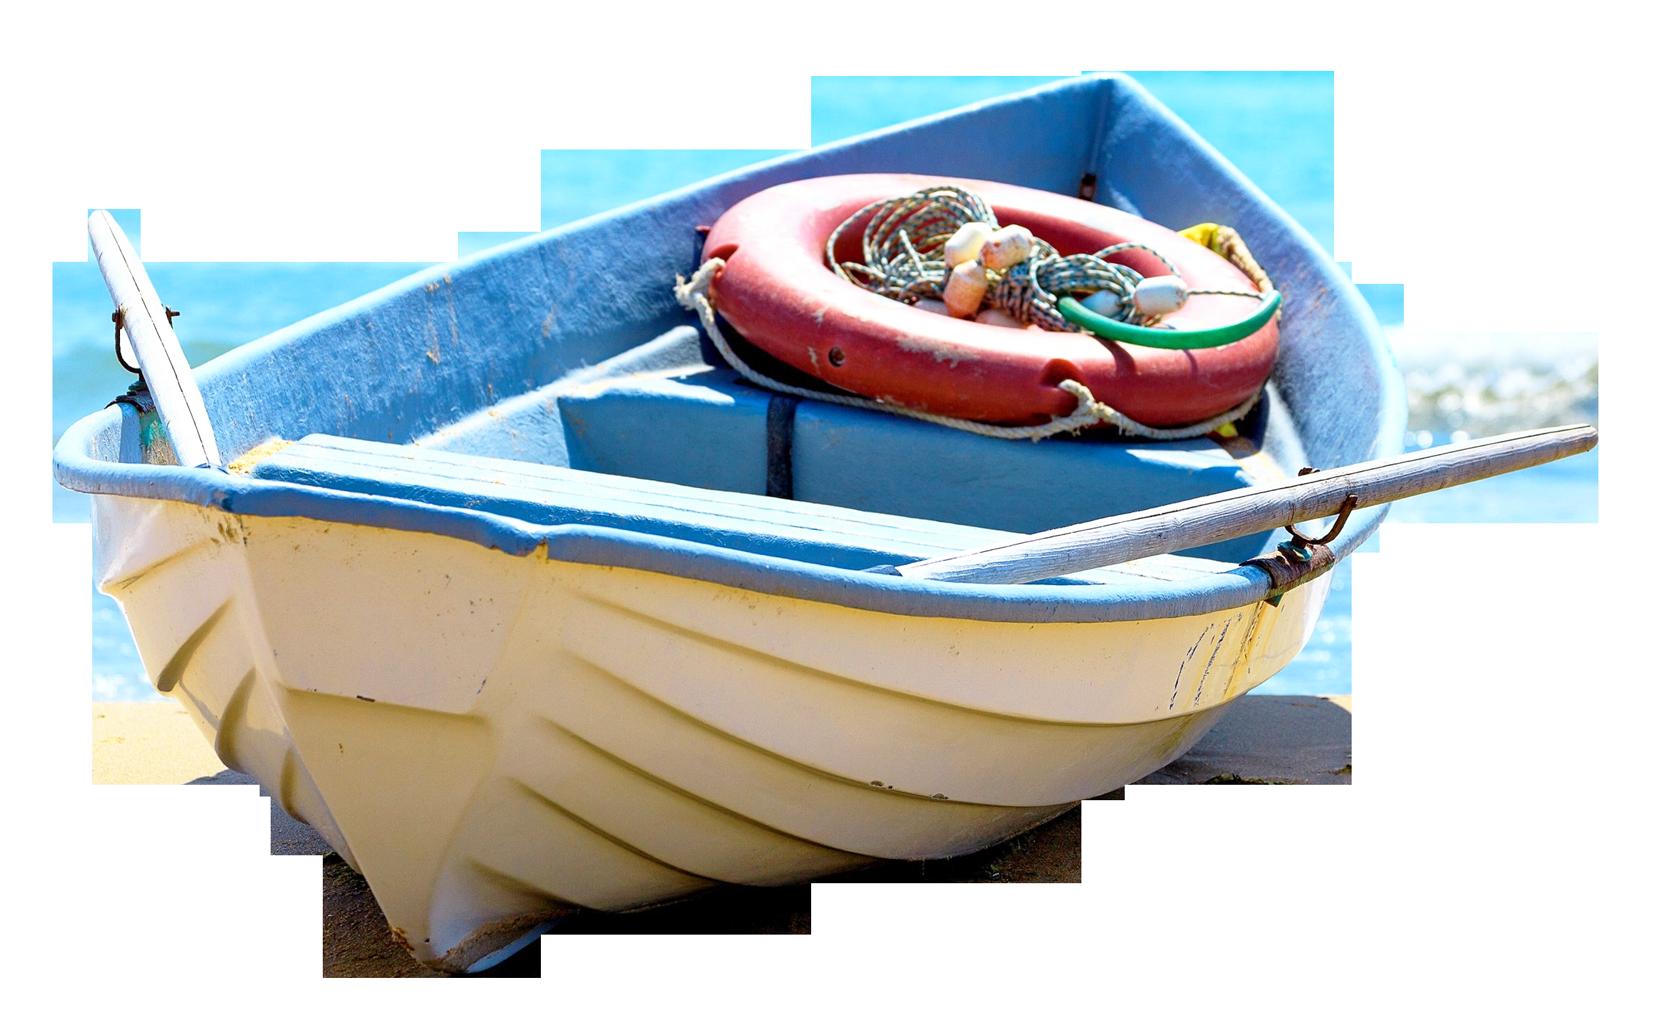 Fishing Boat PNG Transparent Image.